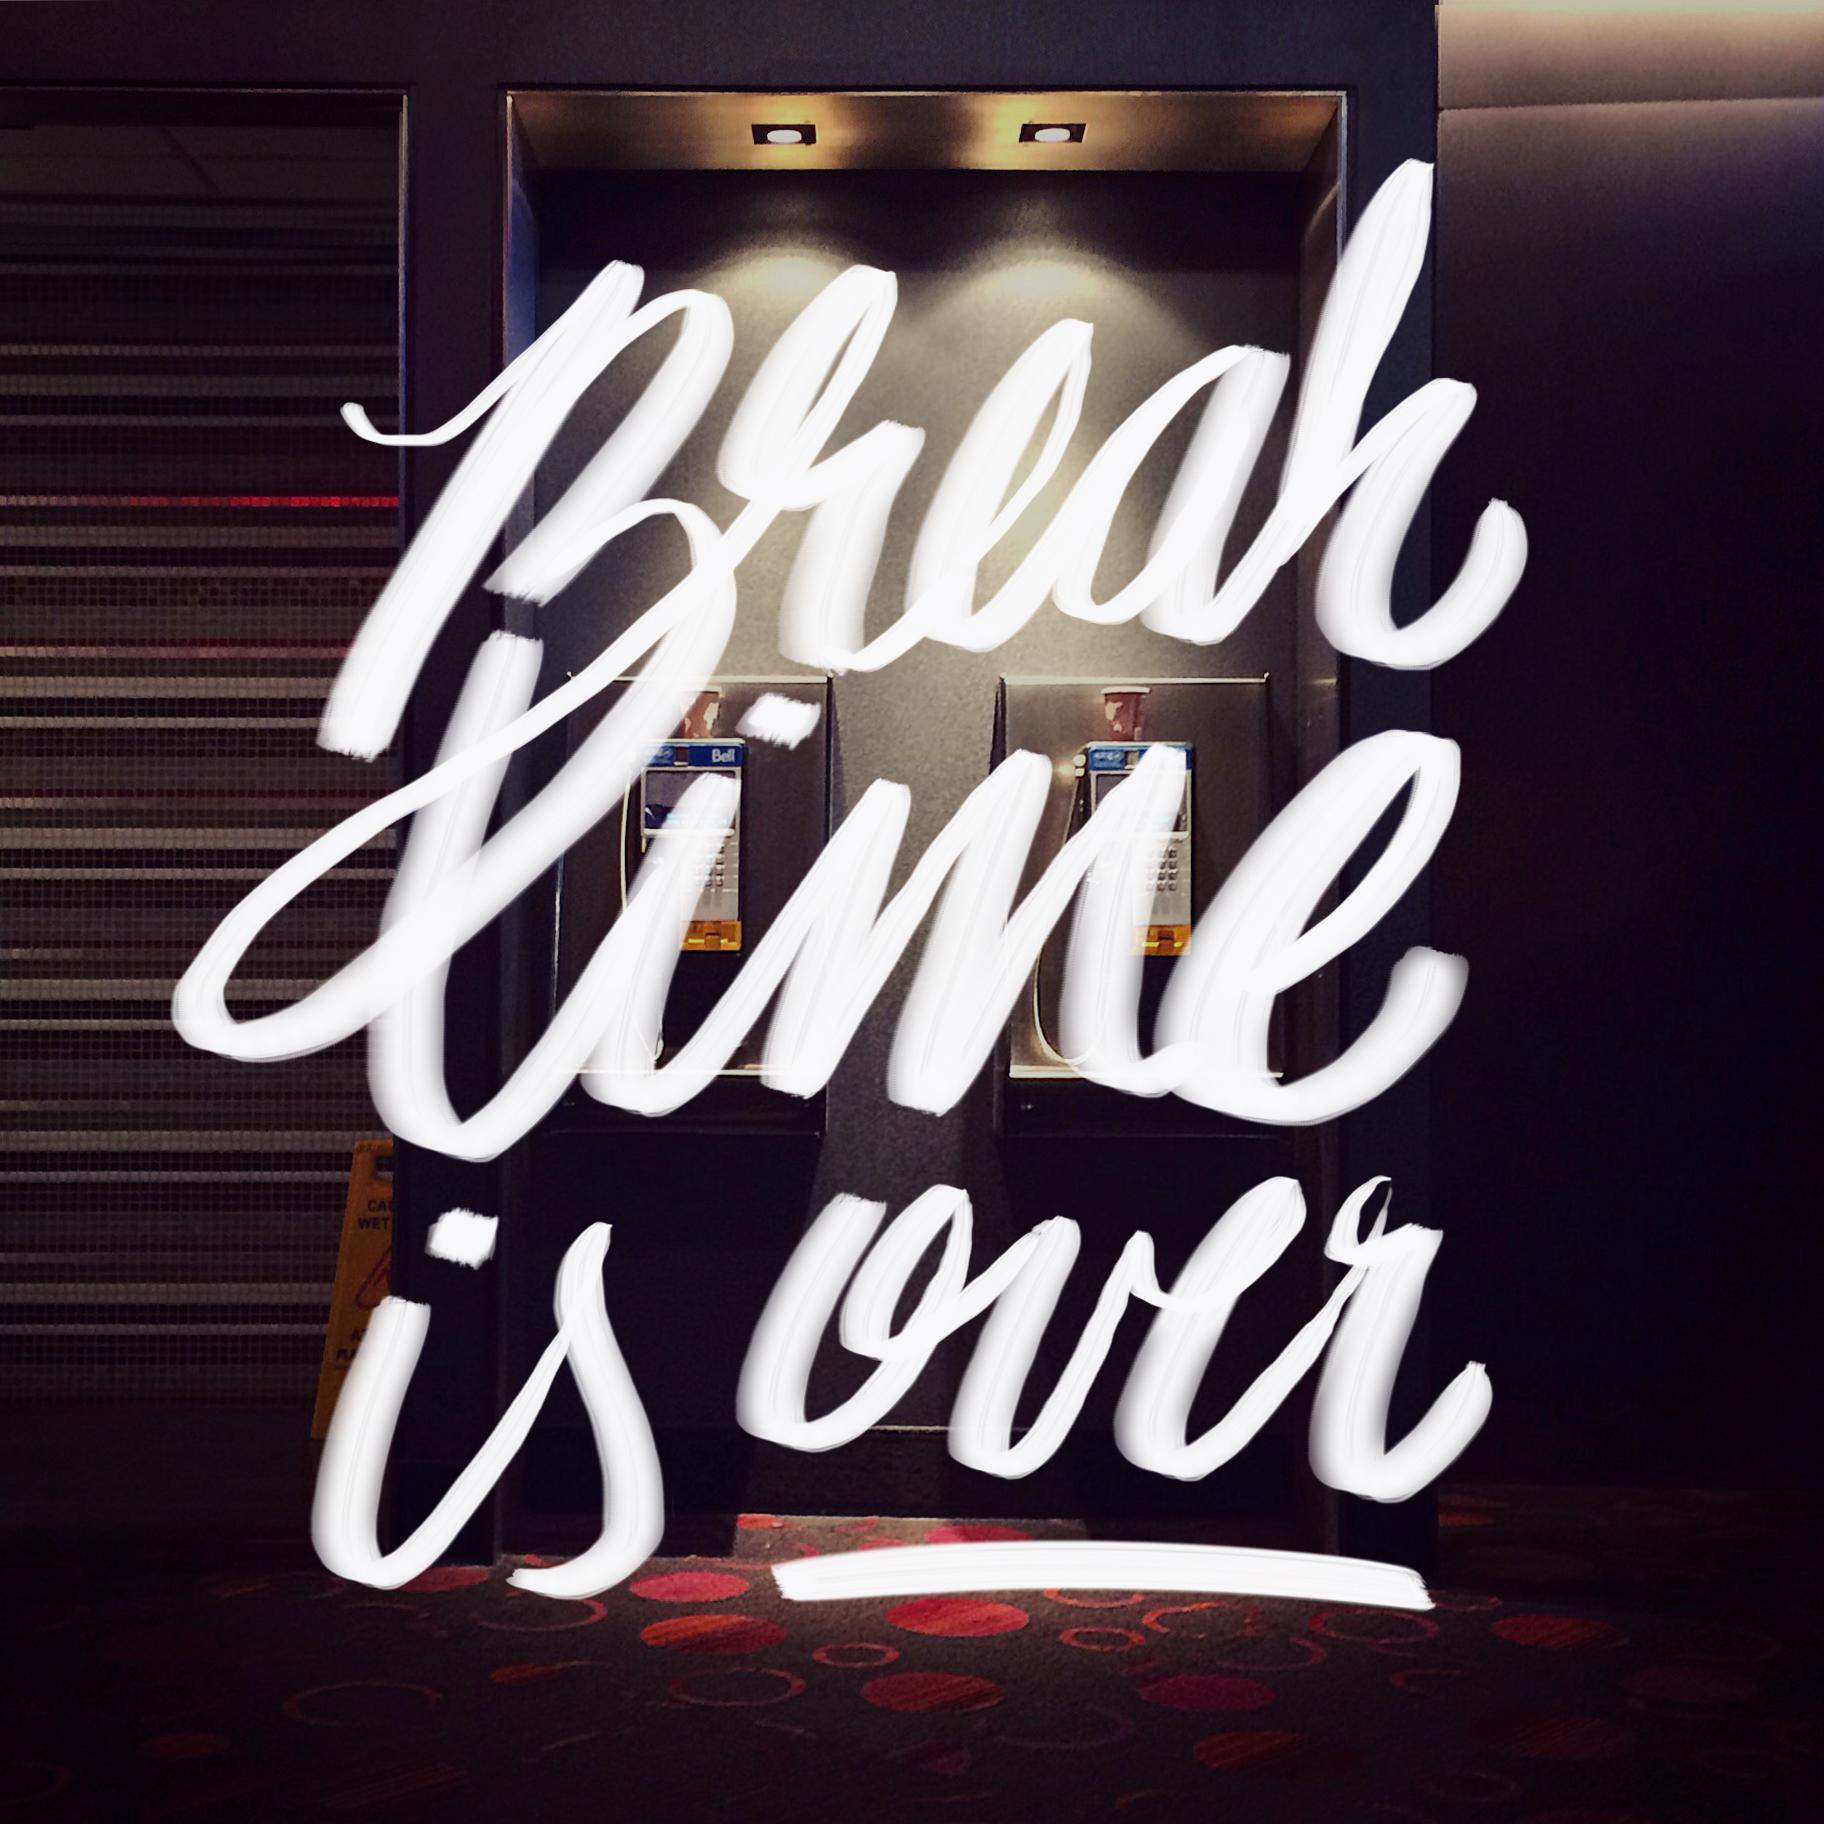 break-time-is-over-macquarrie.jpg